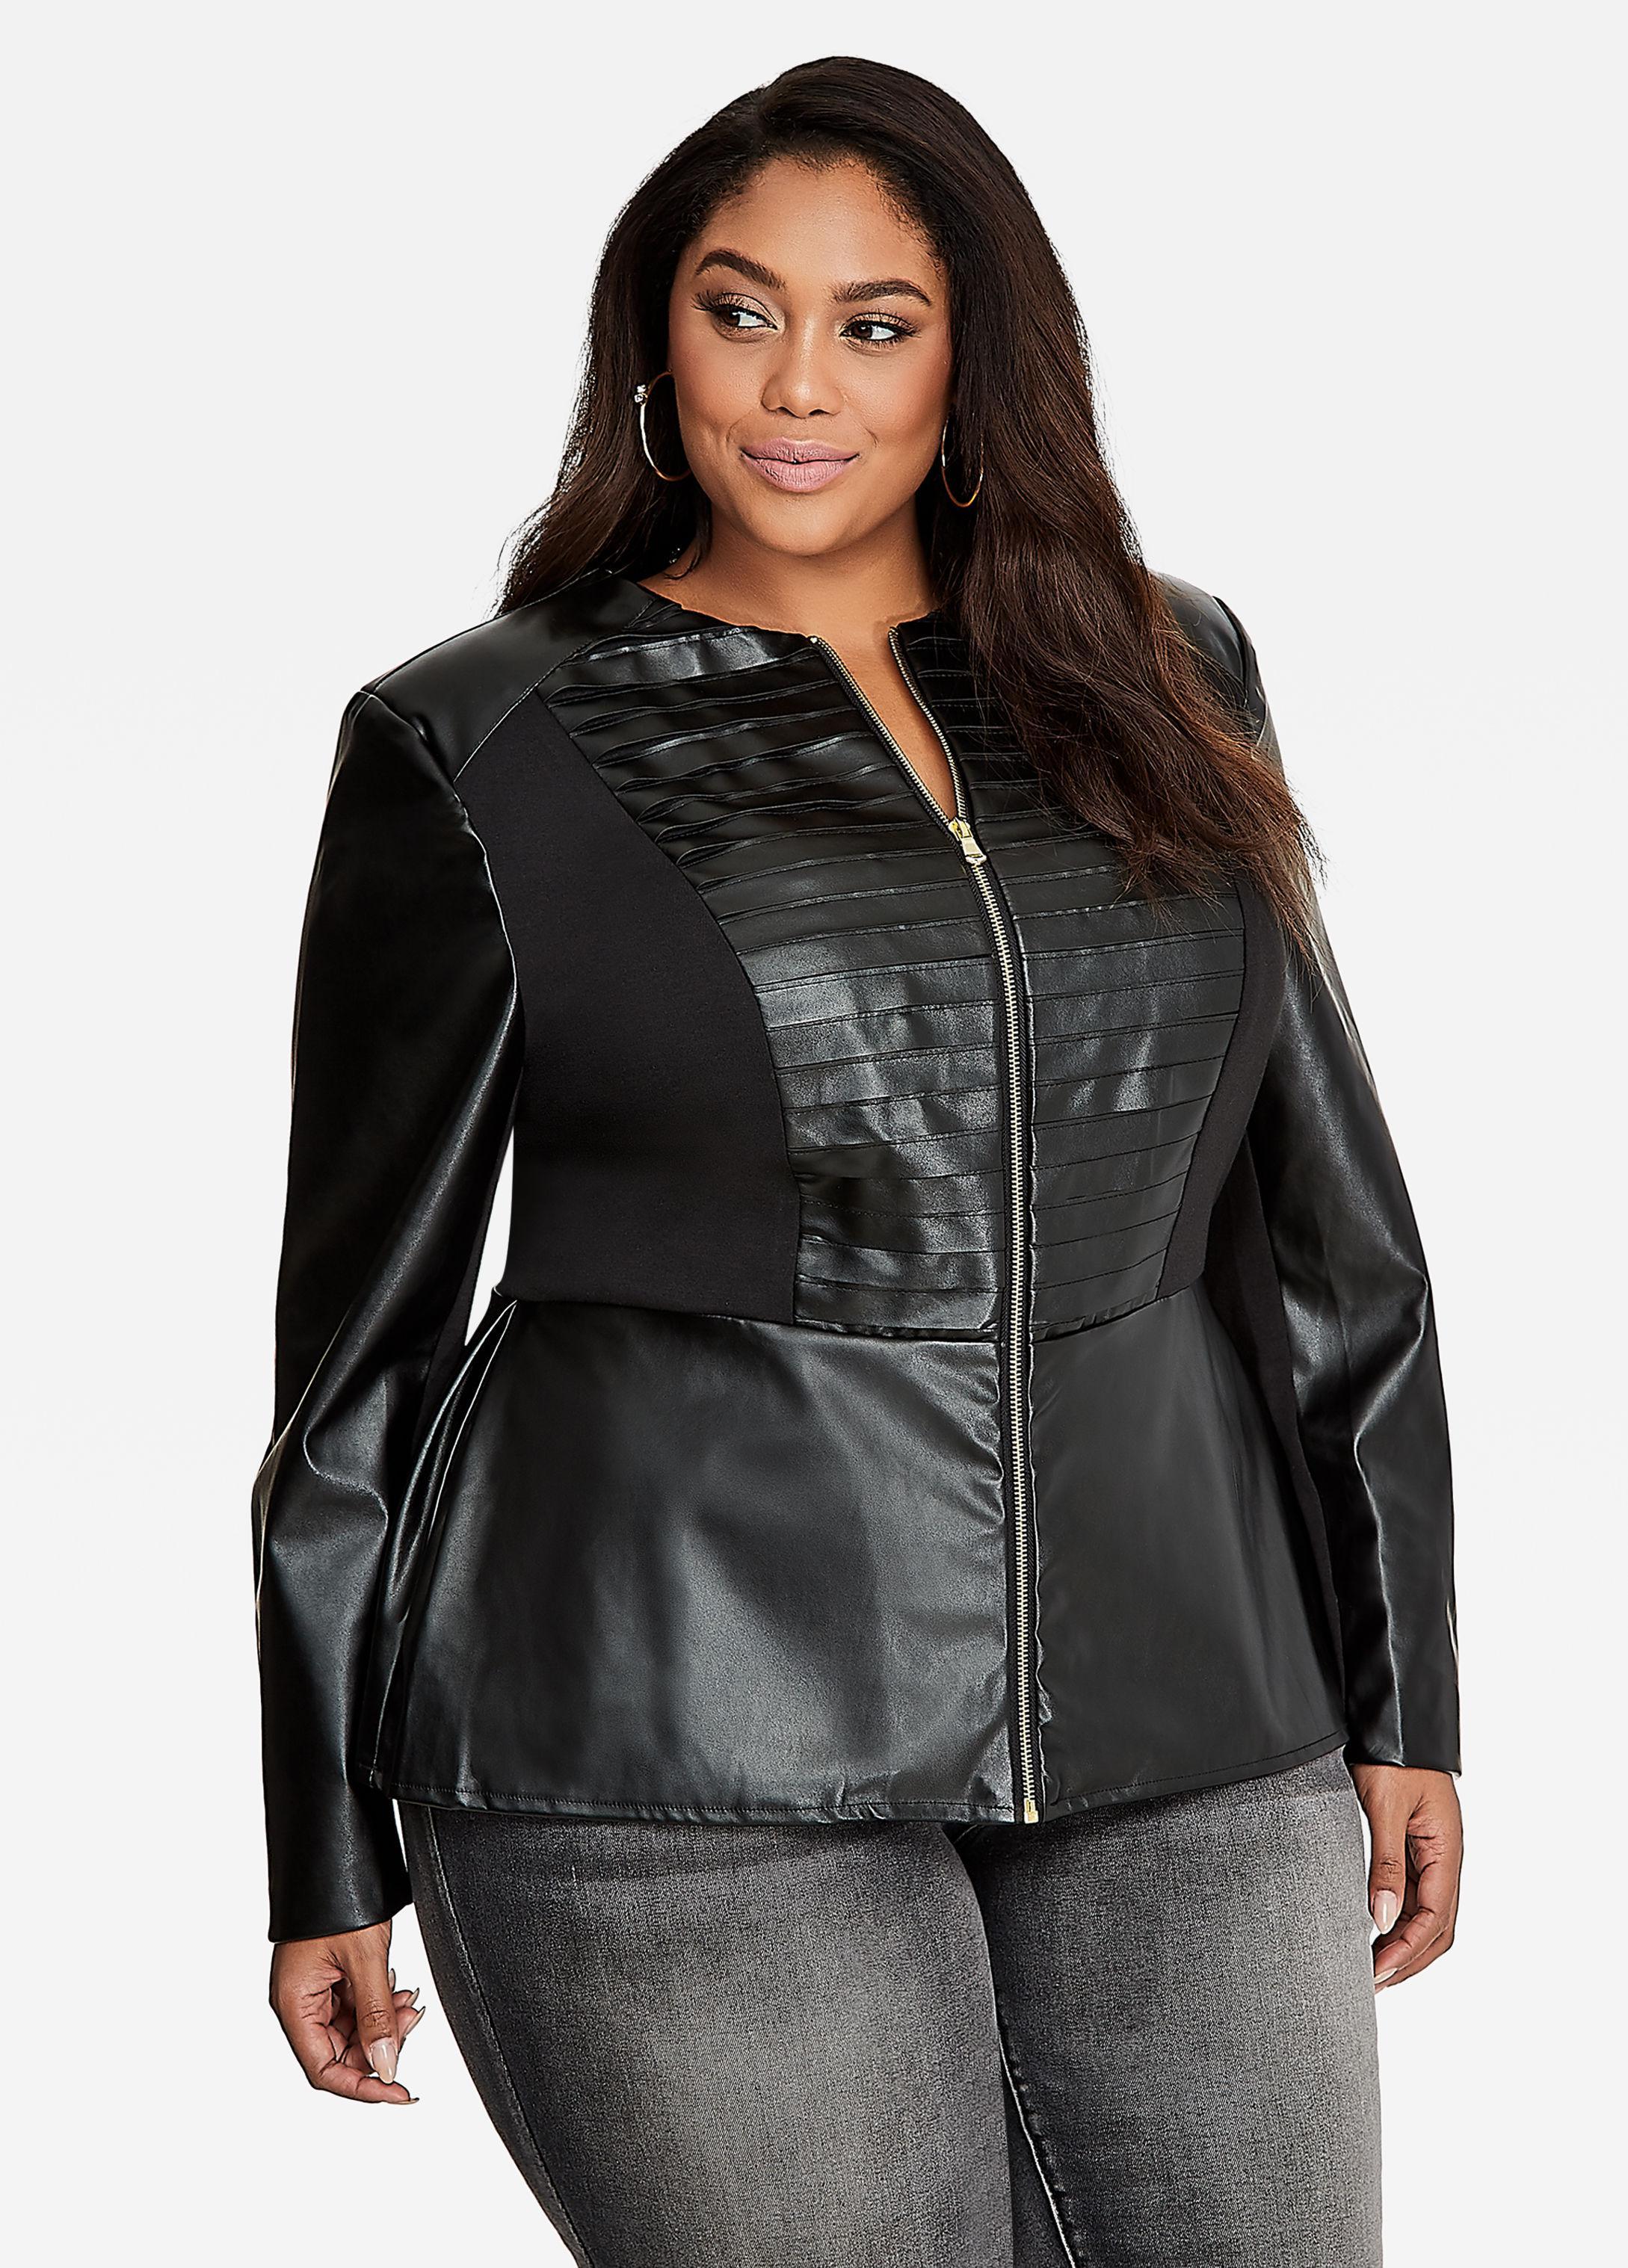 fb72679b4fe Lyst - Ashley Stewart Ponte Leather Combo Peplum Jacket in Black